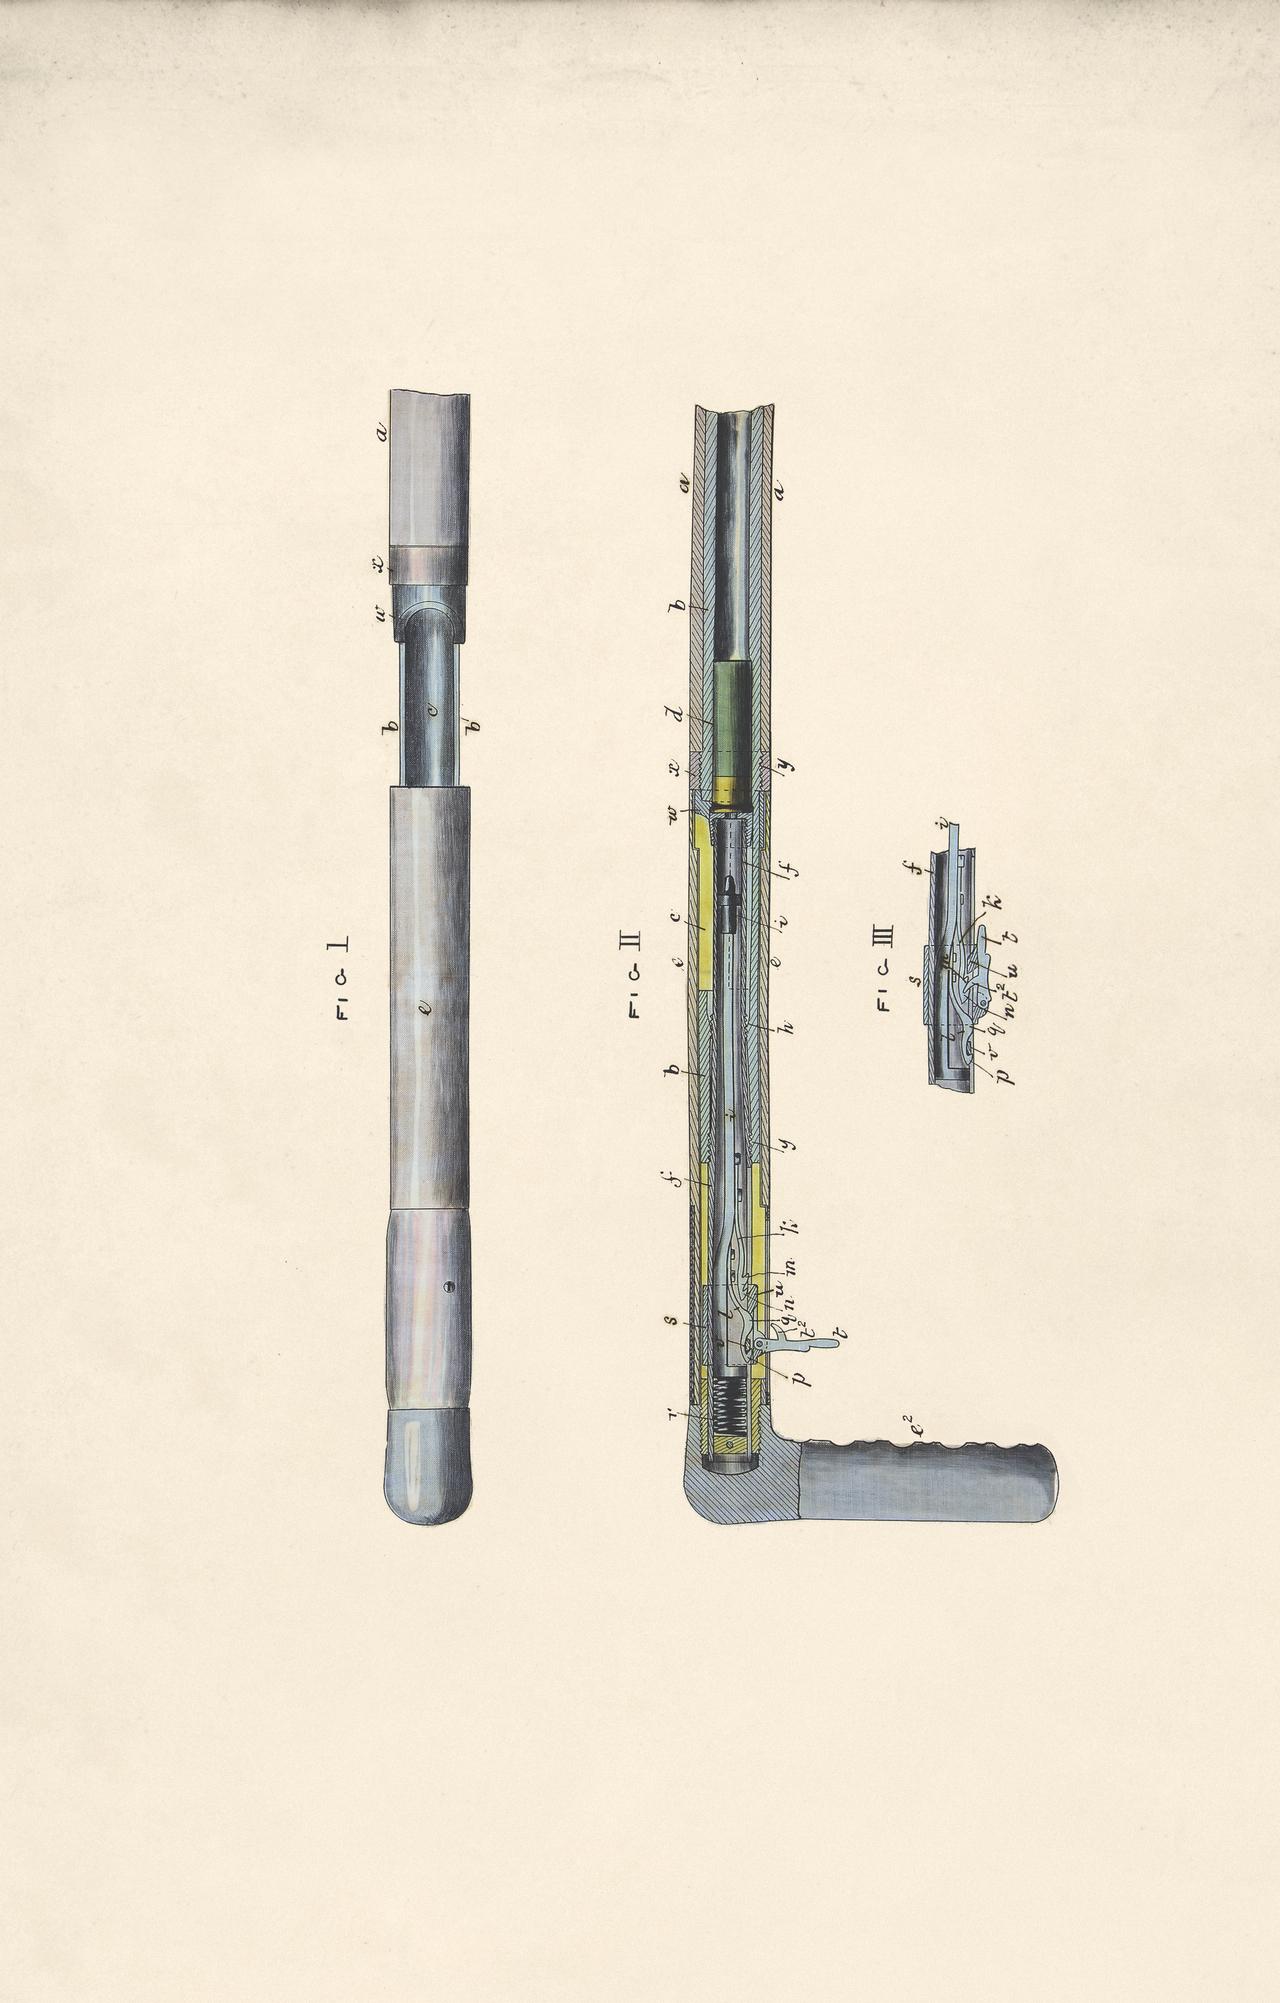 Design for a walking stick gun by John Clark Barnes, 1879 (BT 45/29) (The National Archives, London, England 2014. © 2014 Crown Copyright)